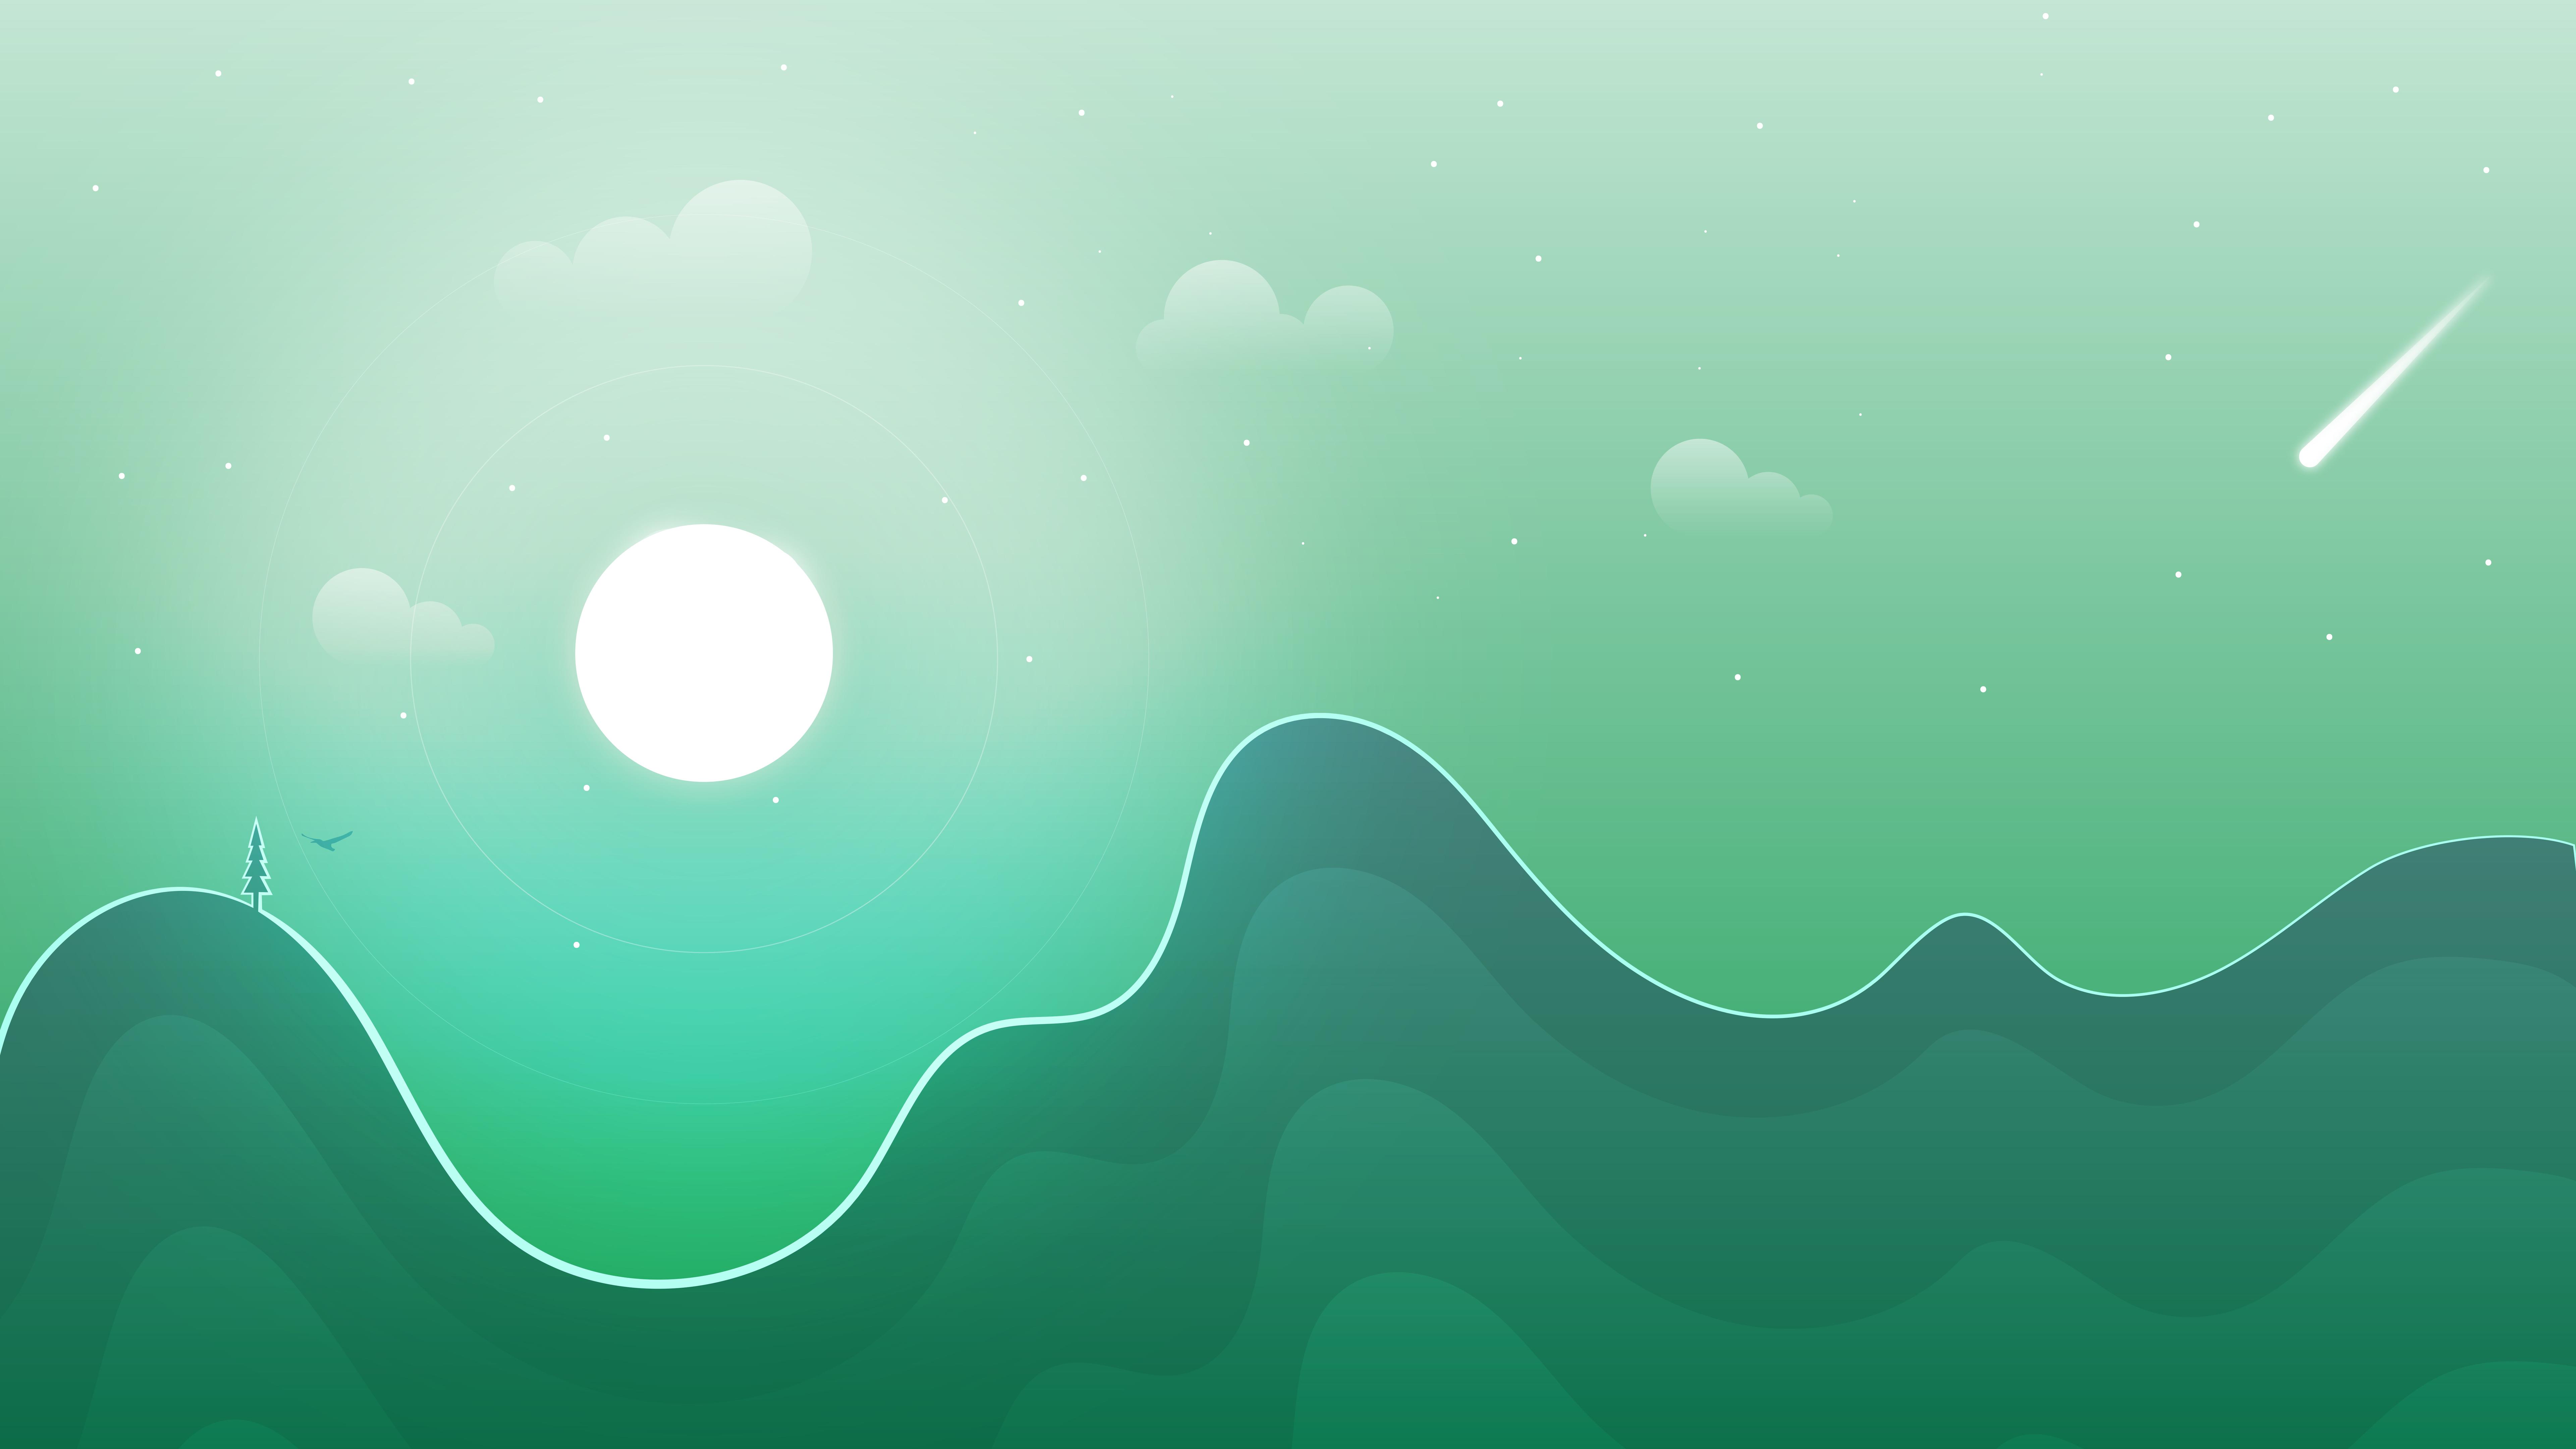 landscape-minimalist-10k-r1.jpg